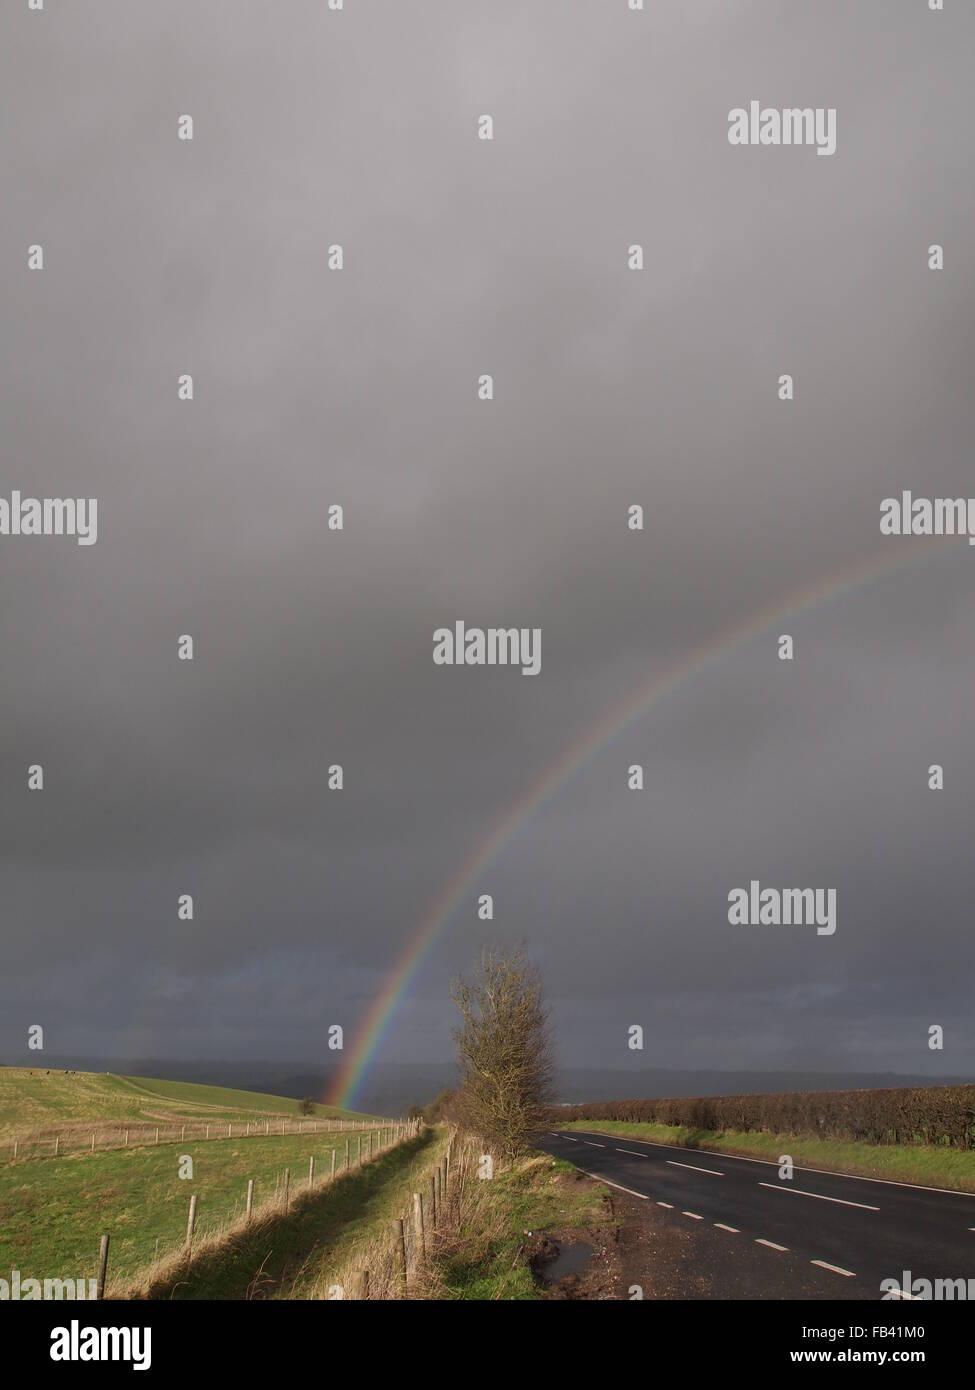 rainbow arc, road in distance grey stormy sky, rain showers - Stock Image